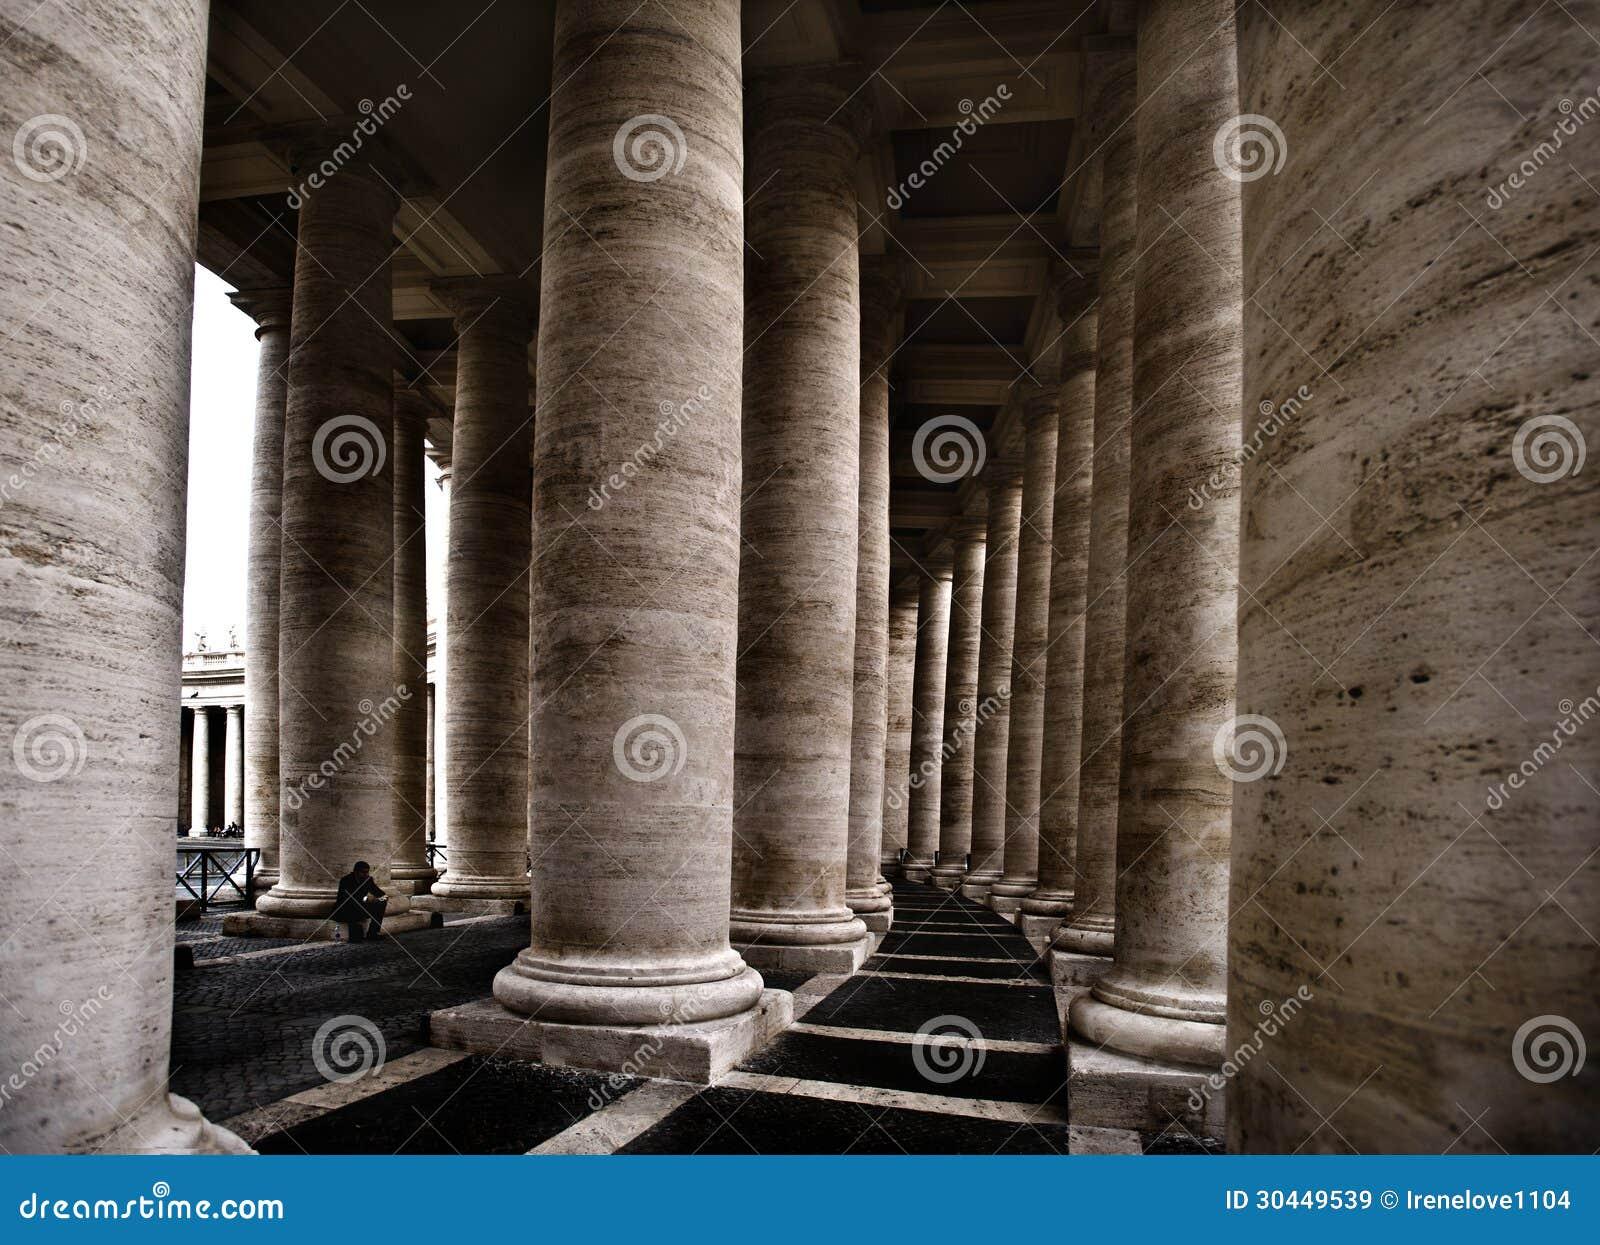 Old Stone Pillars : Stone pillars stock image of decoration church